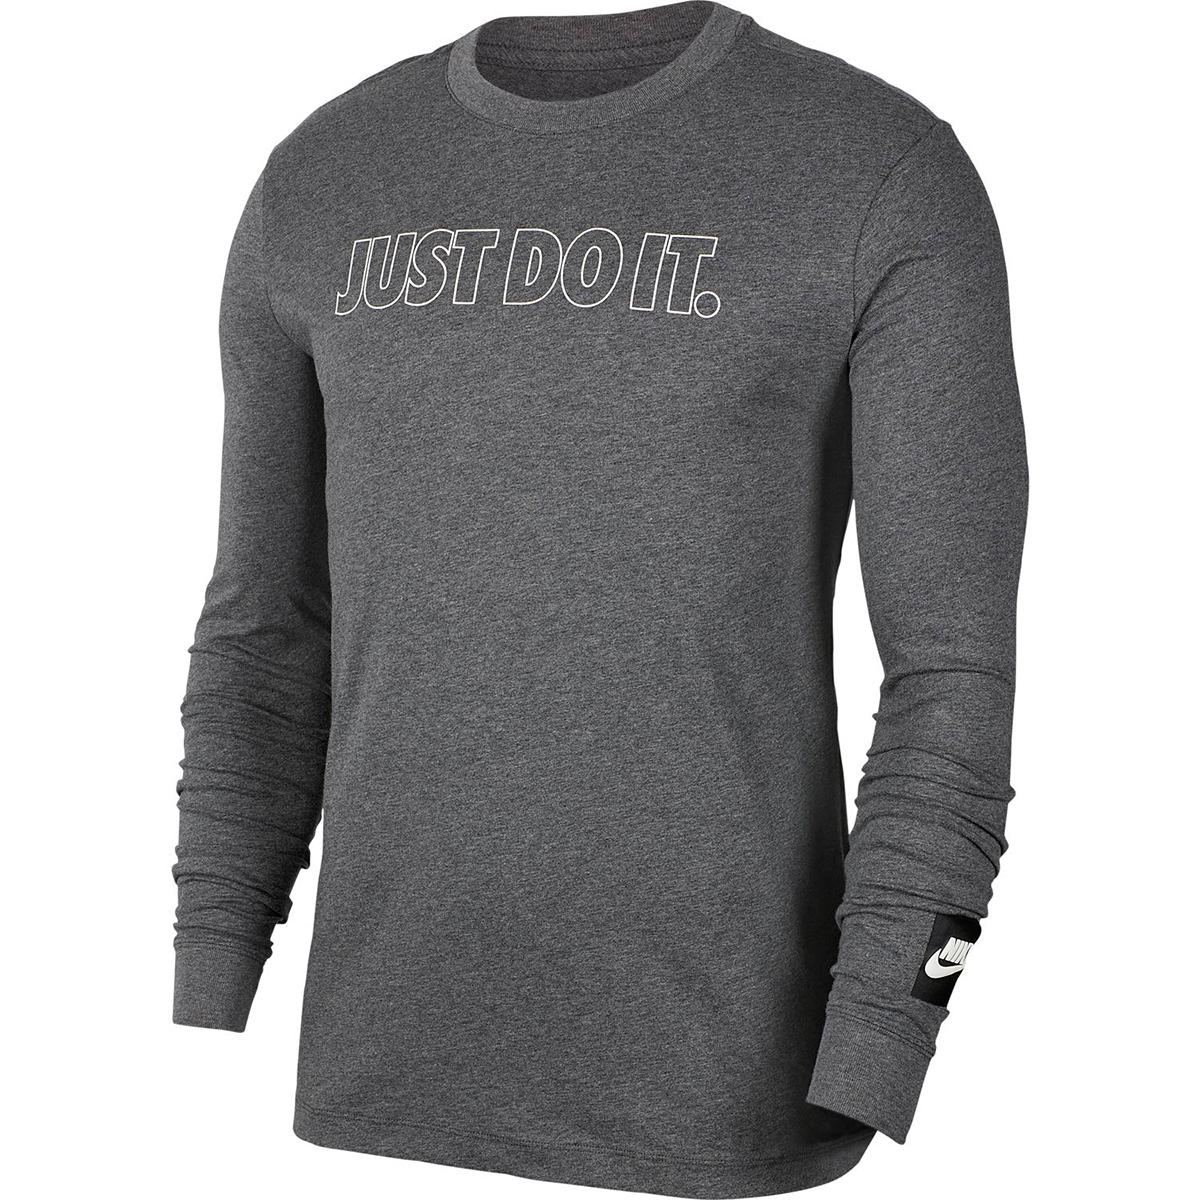 Nike Men's Long-Sleeve Just Do It Outline Tee - Black, XL